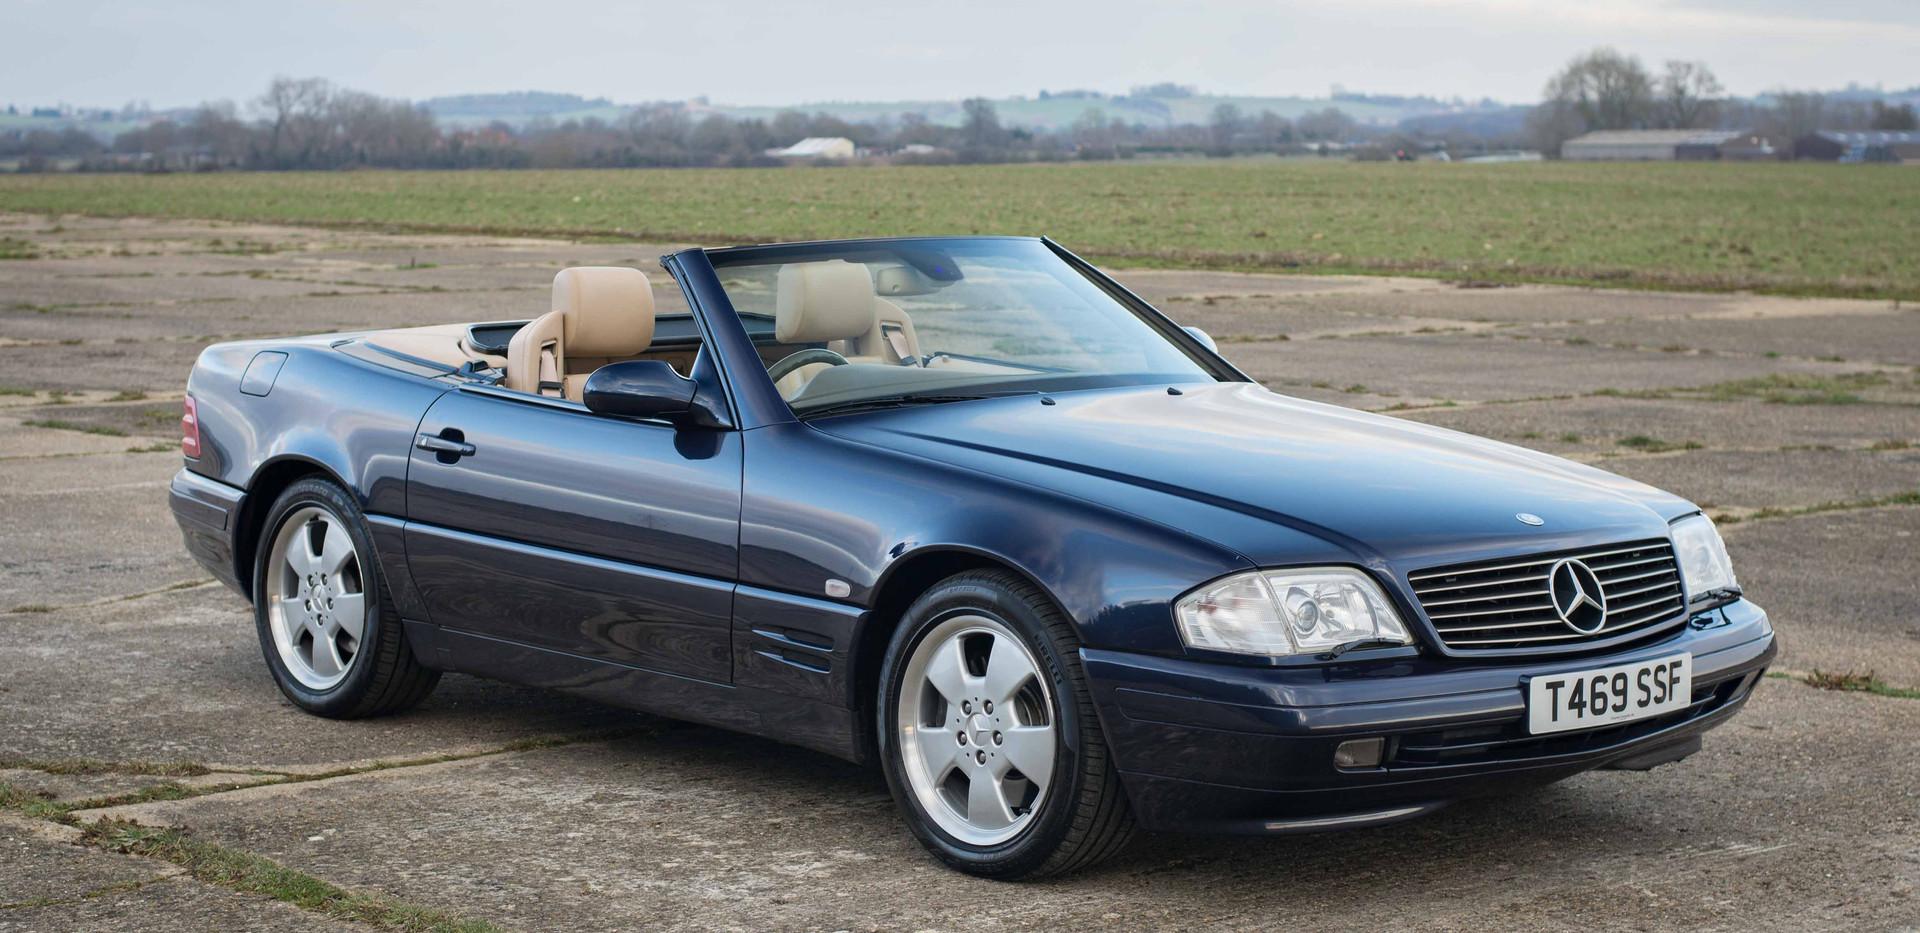 SL500 For Sale UK London  (6 of 36).jpg